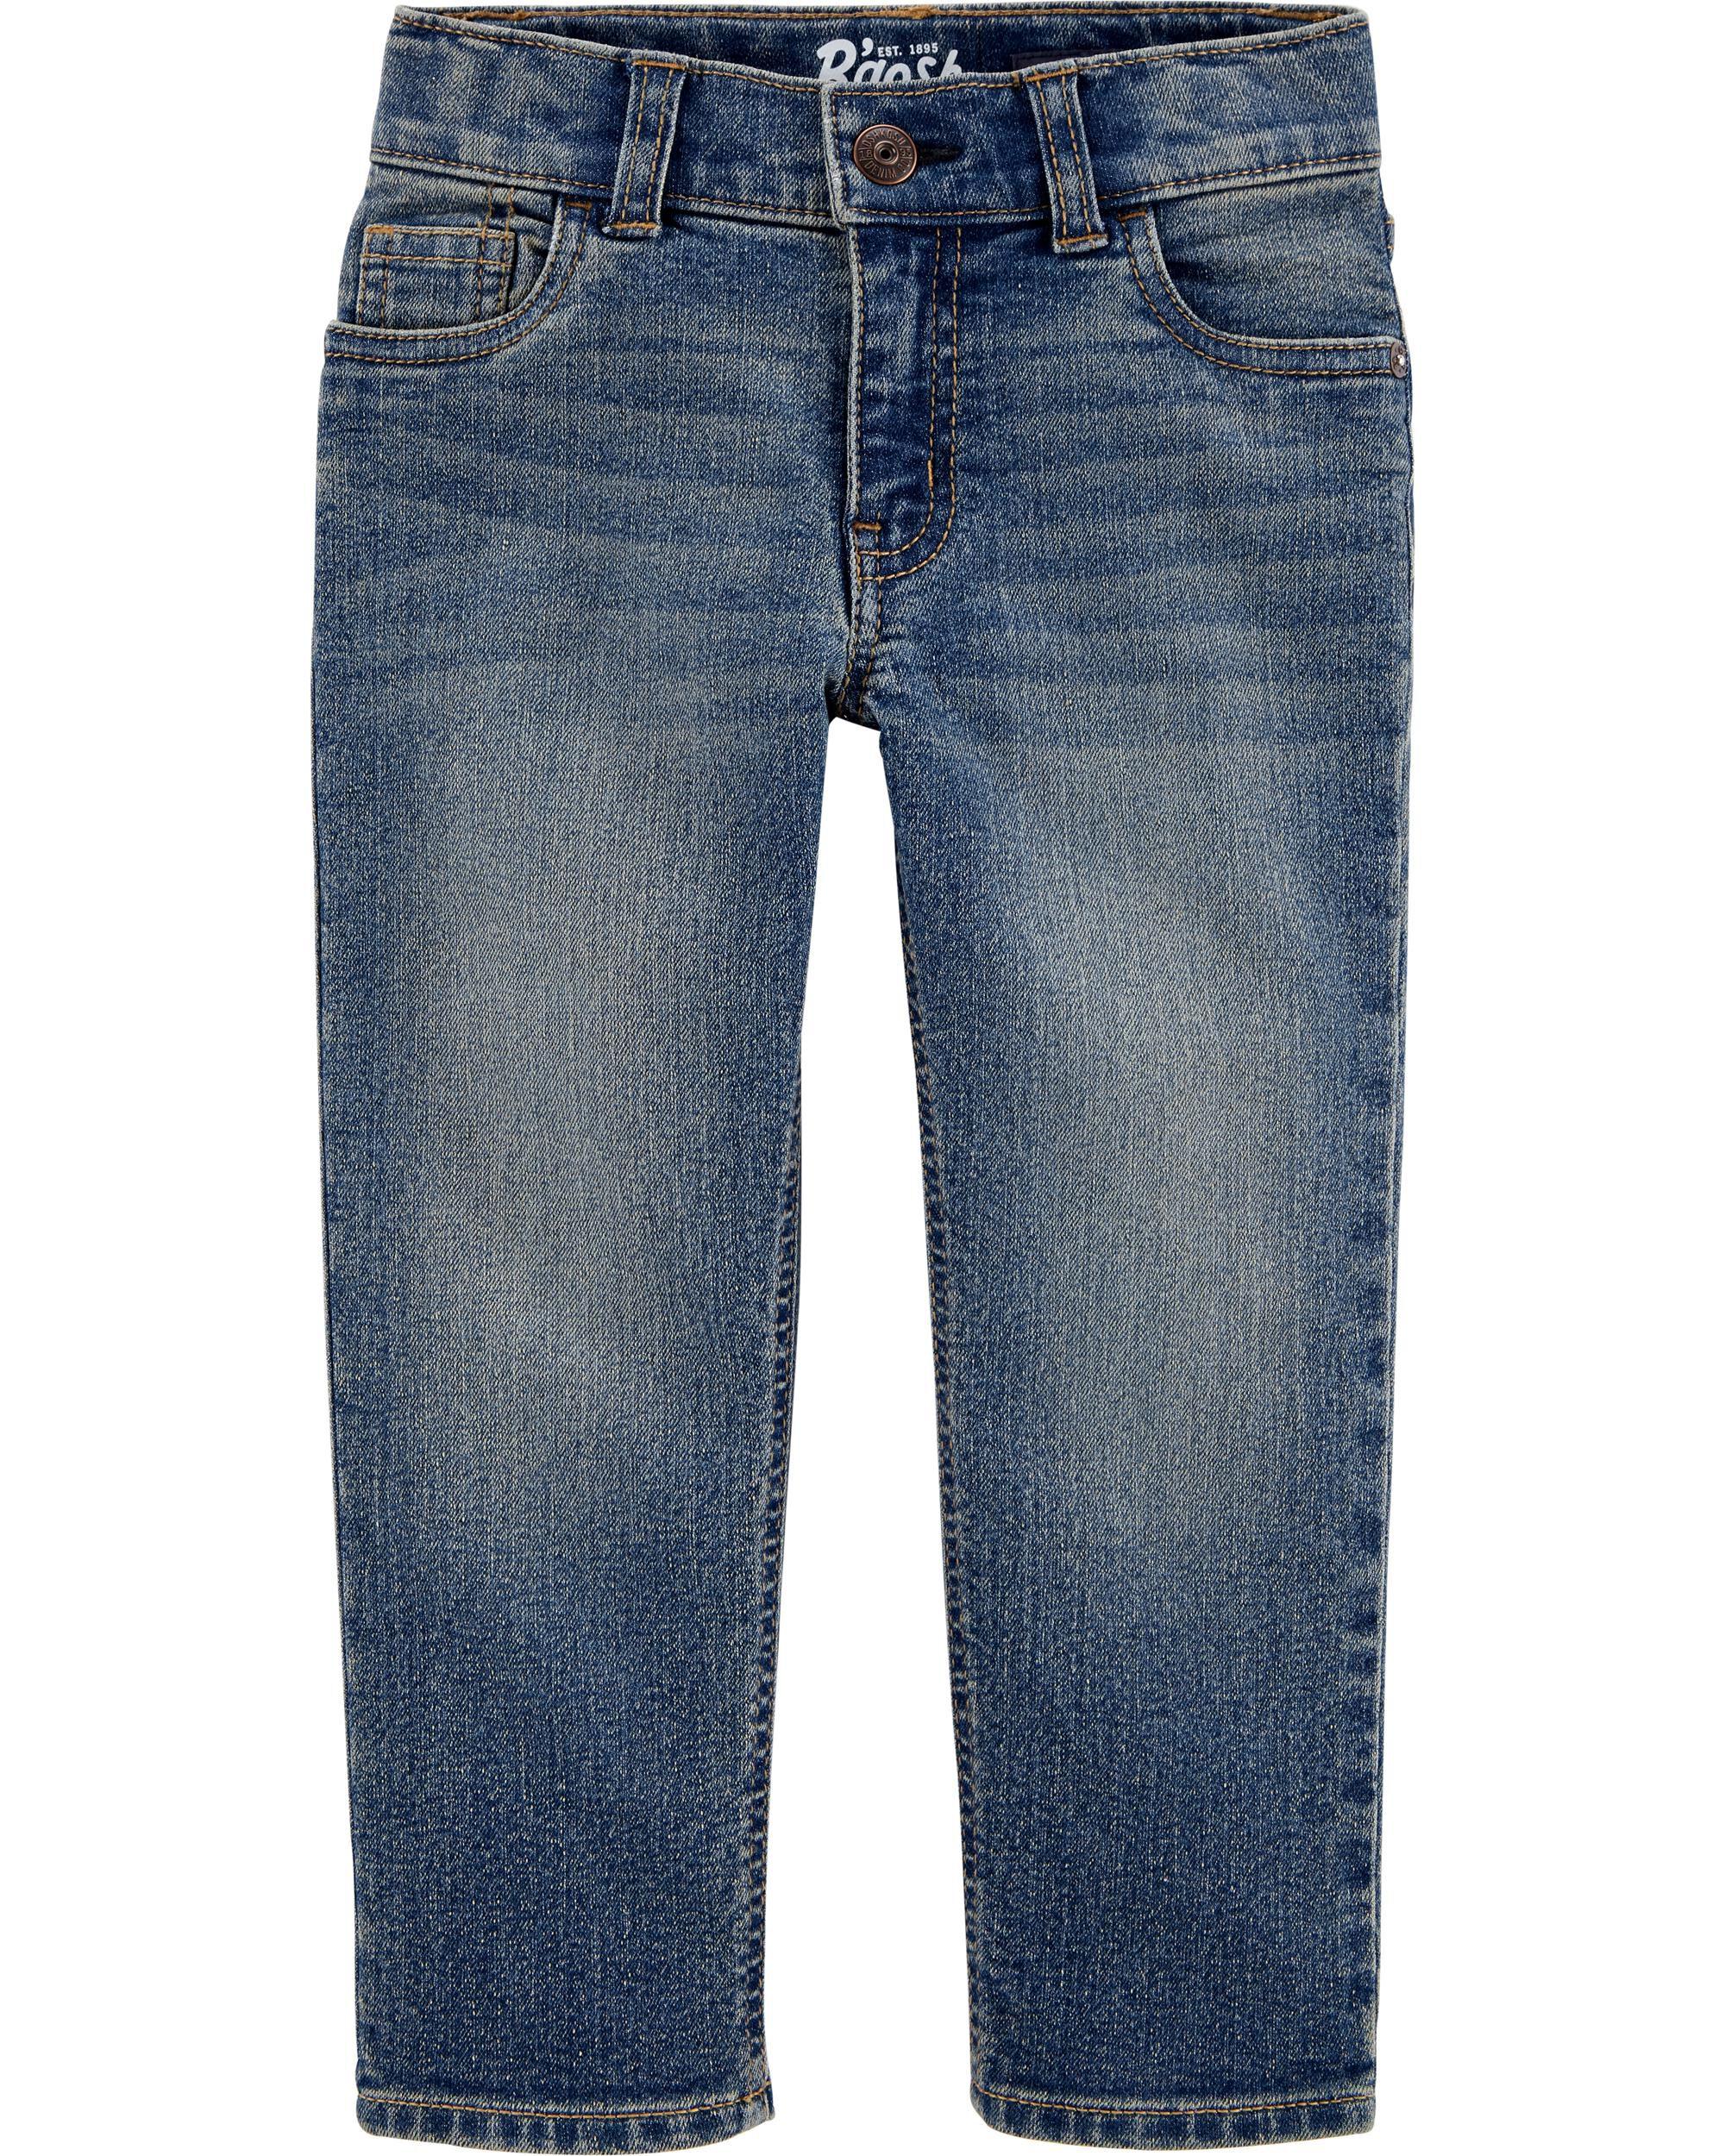 *DOORBUSTER*Classic Jeans - Tumble Medium Faded Wash